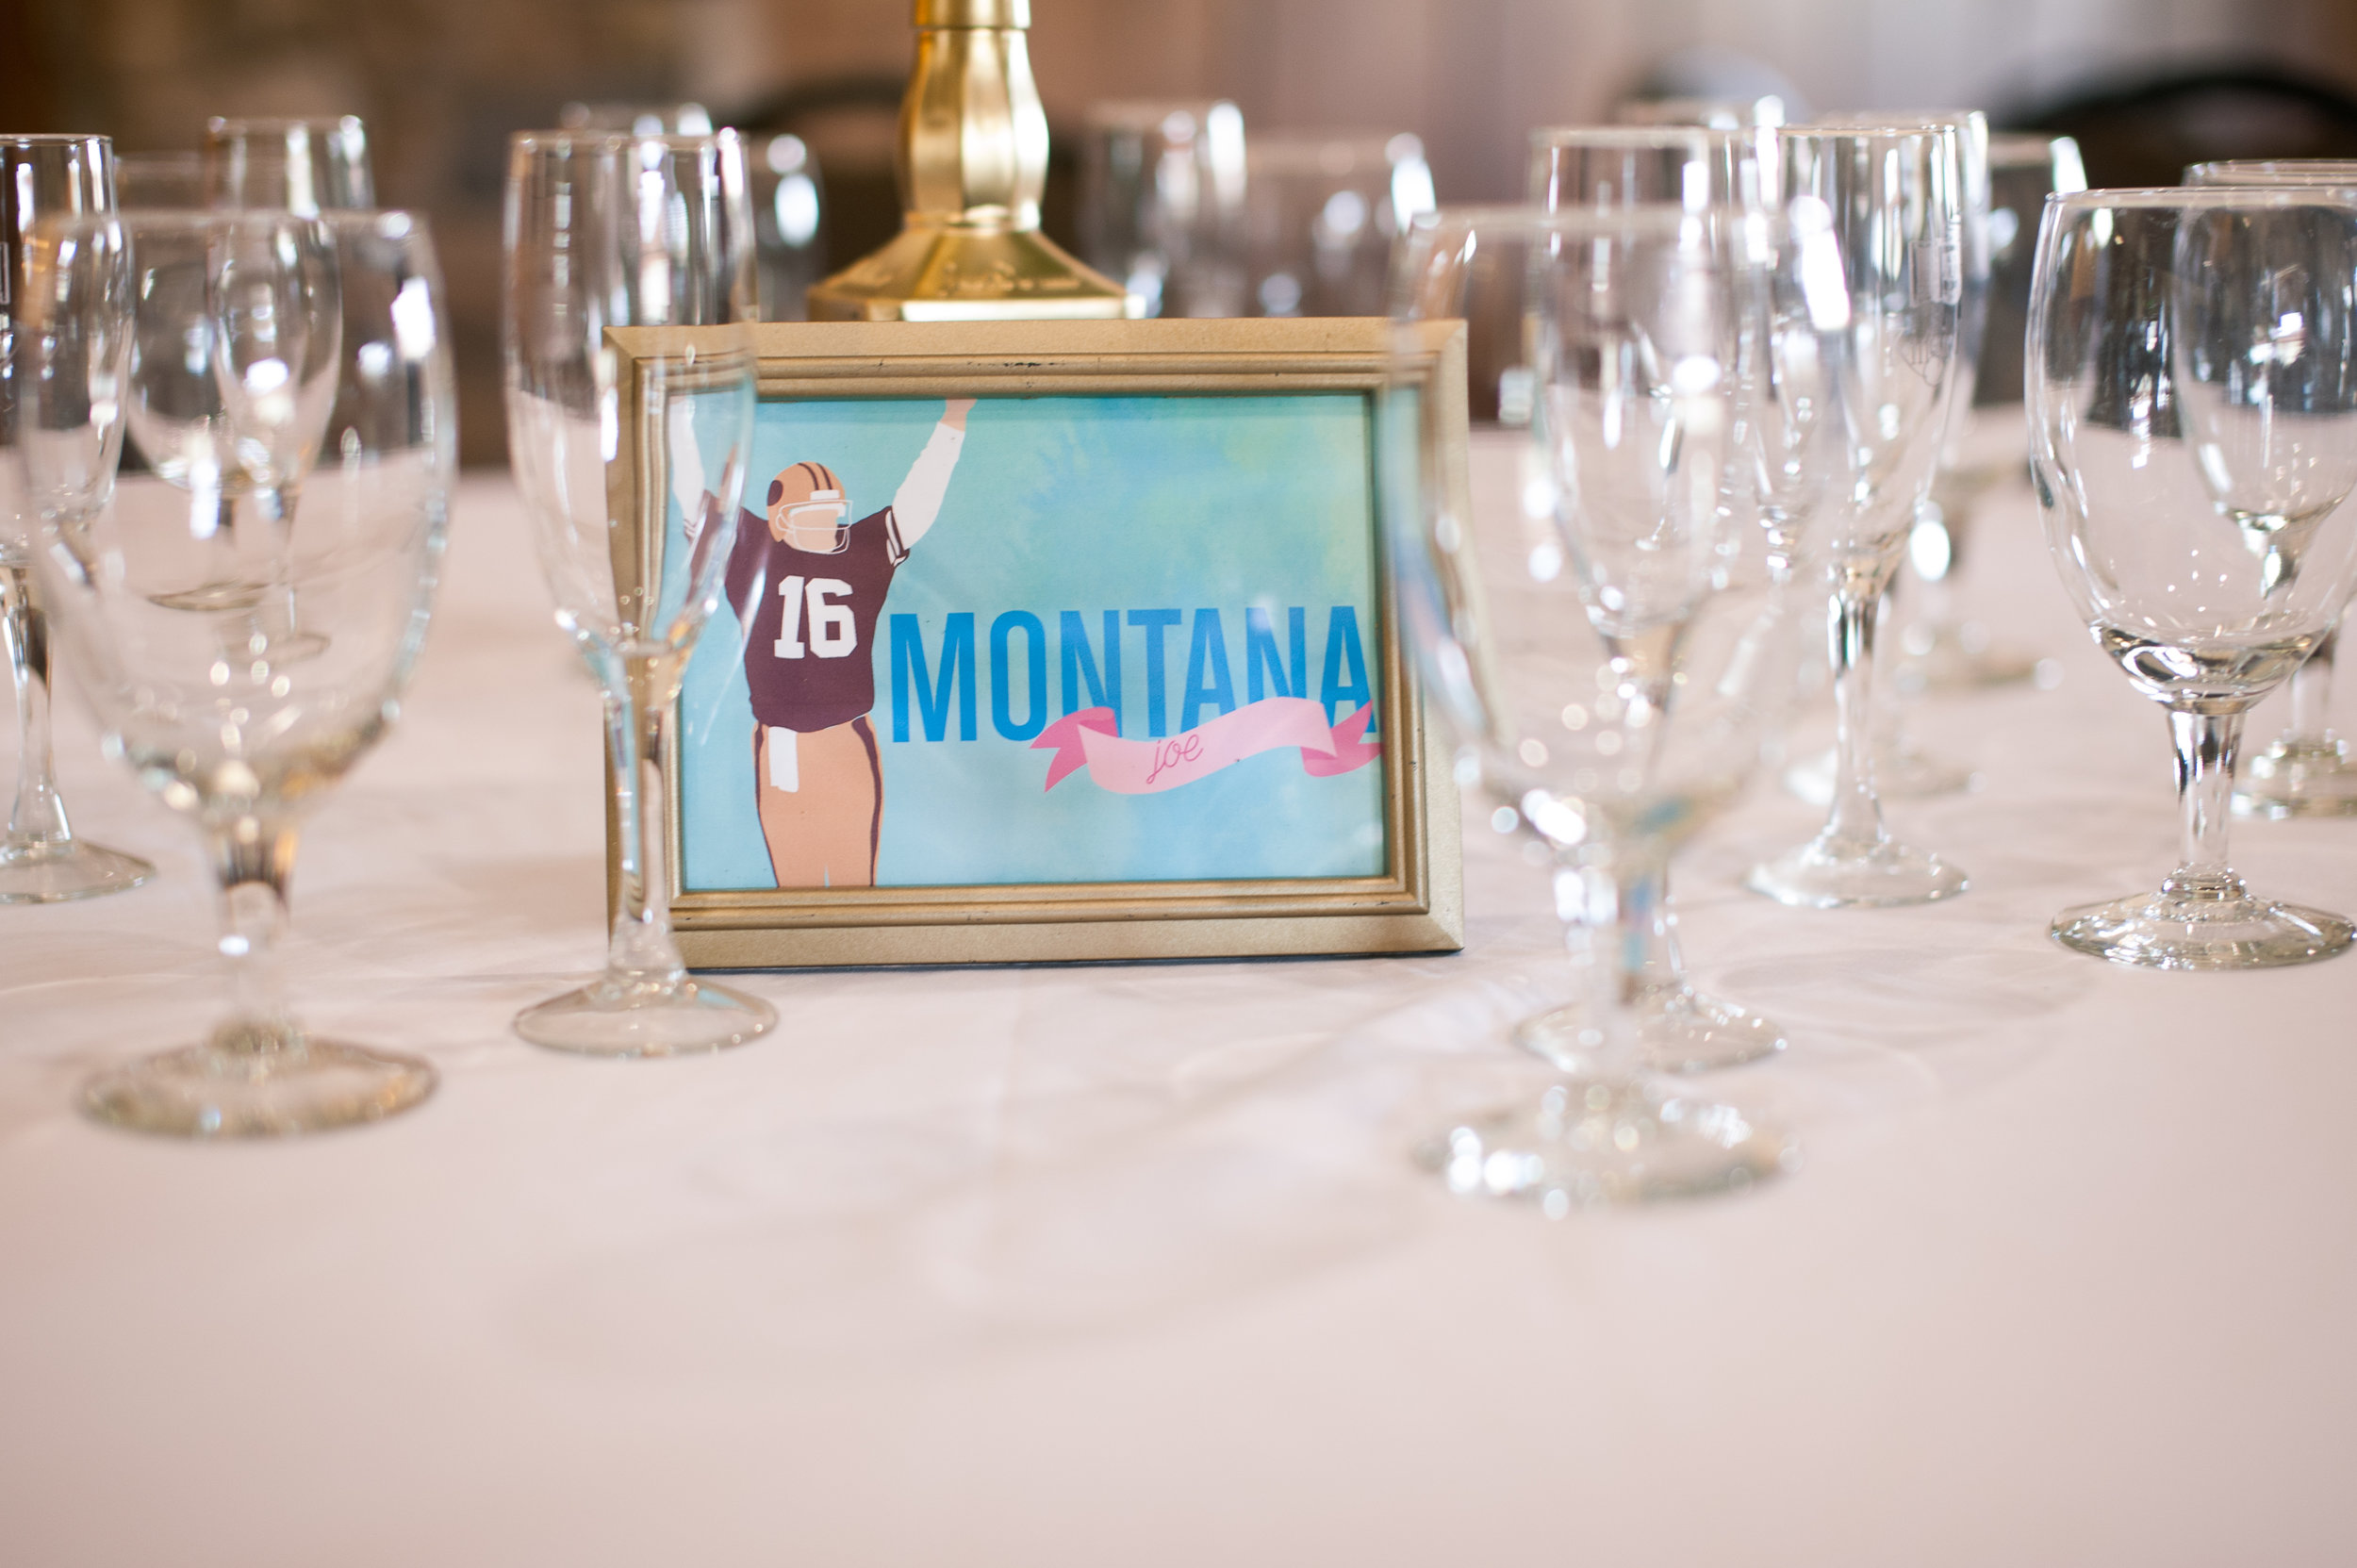 rita-alexis-design-wedding-joe-montana.JPG